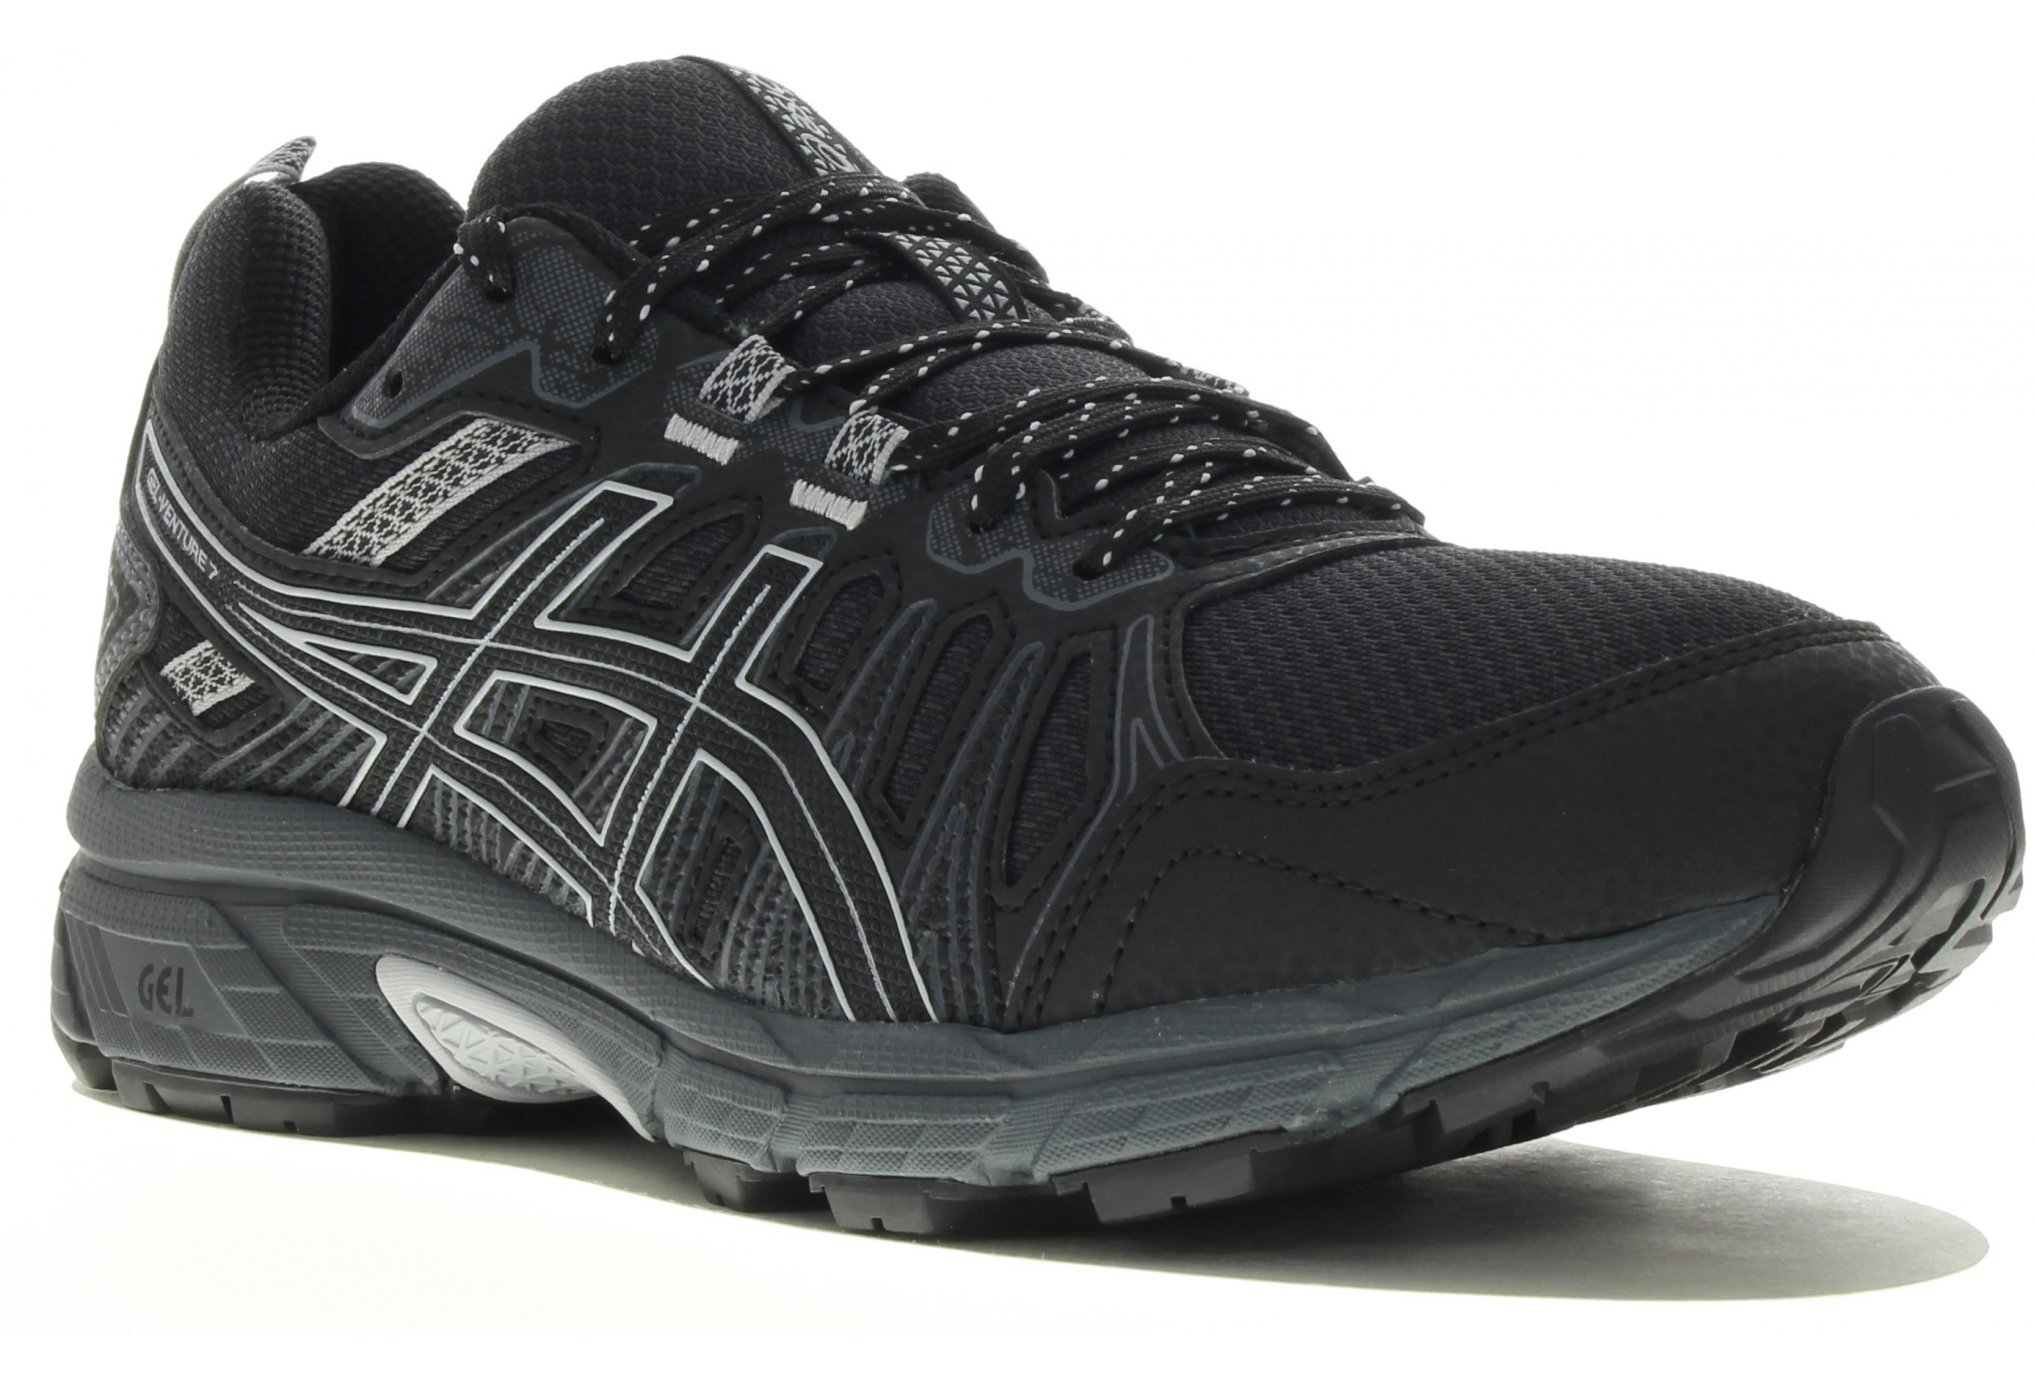 Asics Gel-Venture 7 W Chaussures running femme